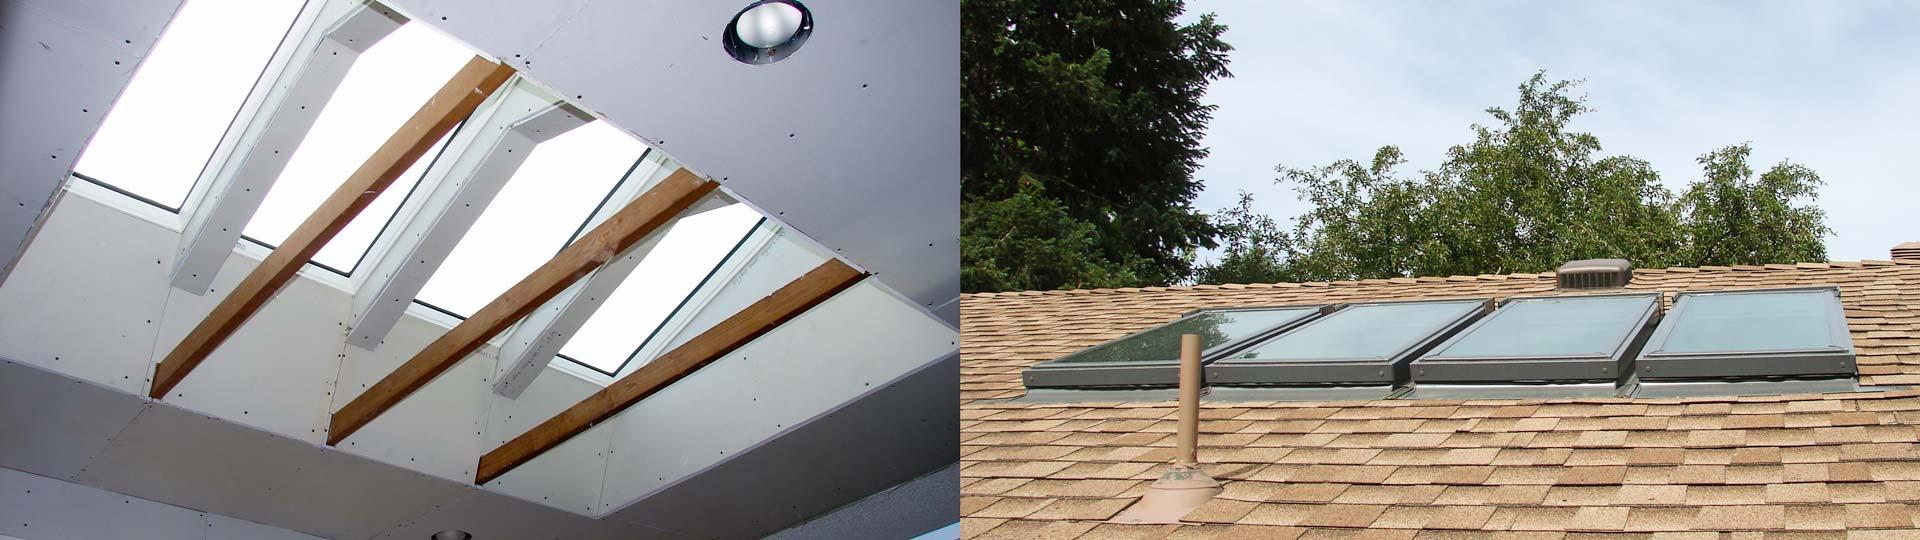 skylight shaft 4x1 13954-8054